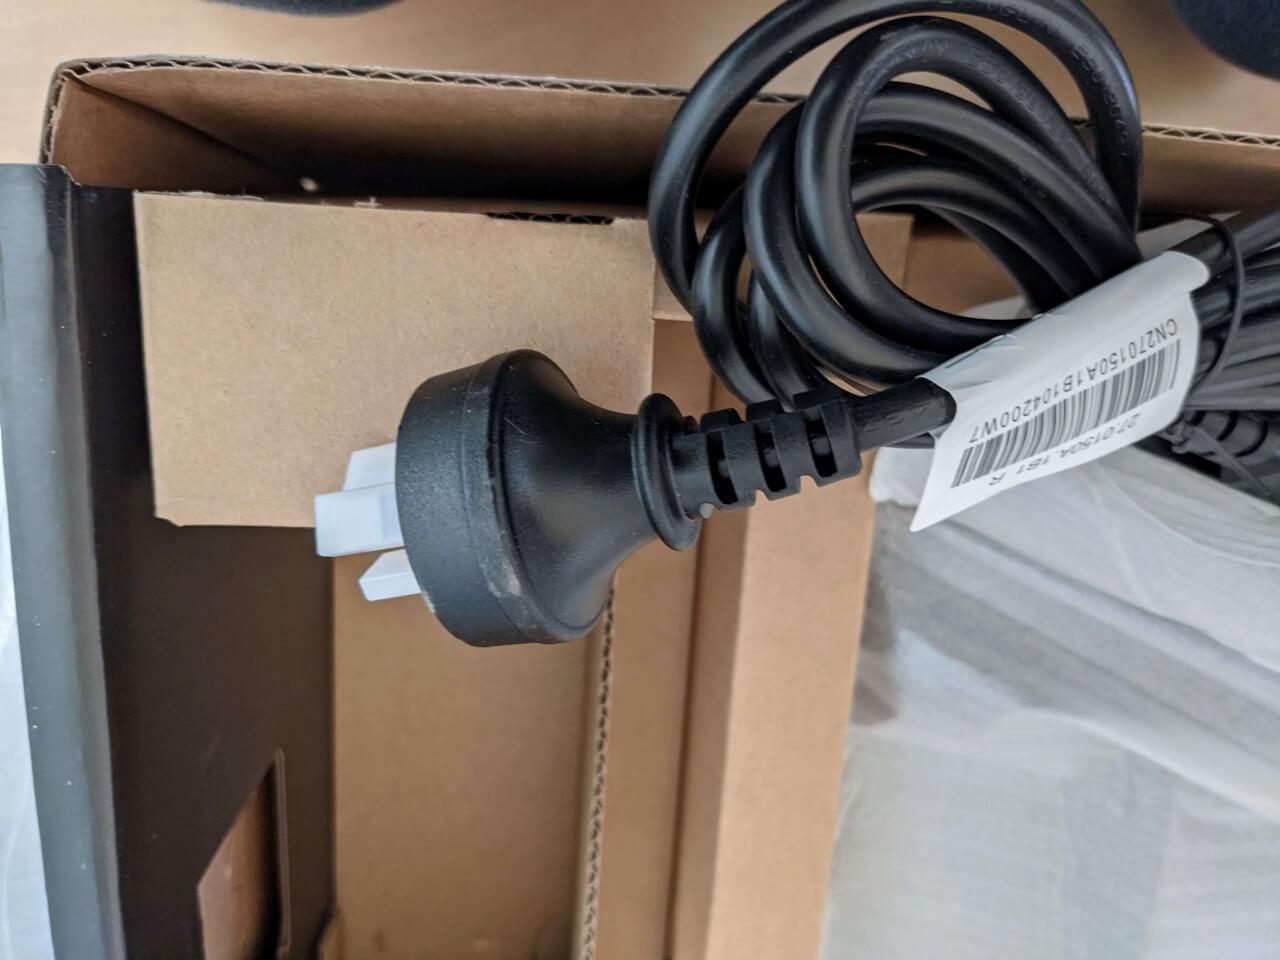 Dell U2720QM koukanhin3